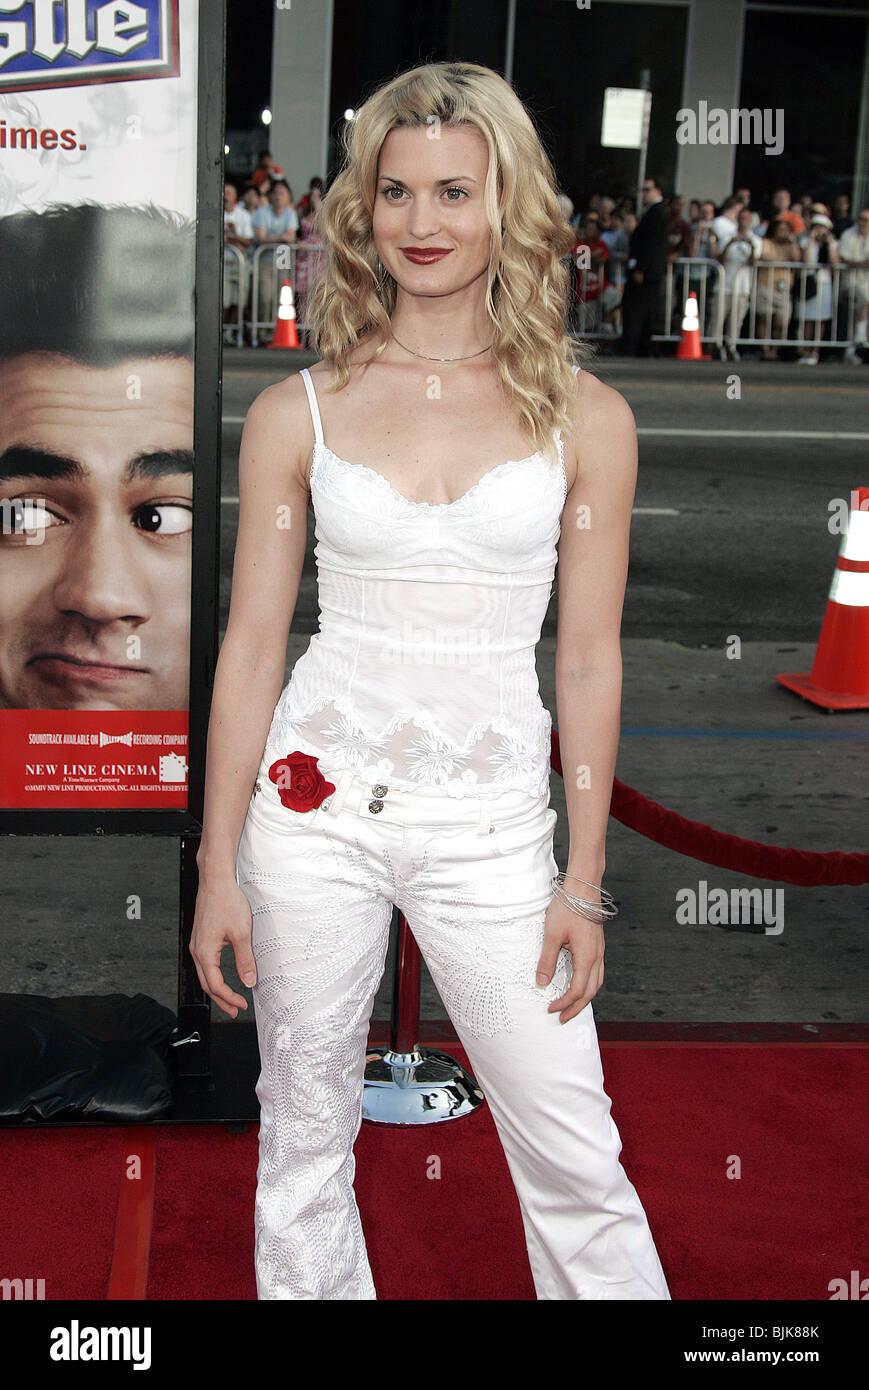 ICloud Brooke D?Orsay nudes (16 photos), Sexy, Fappening, Instagram, panties 2006